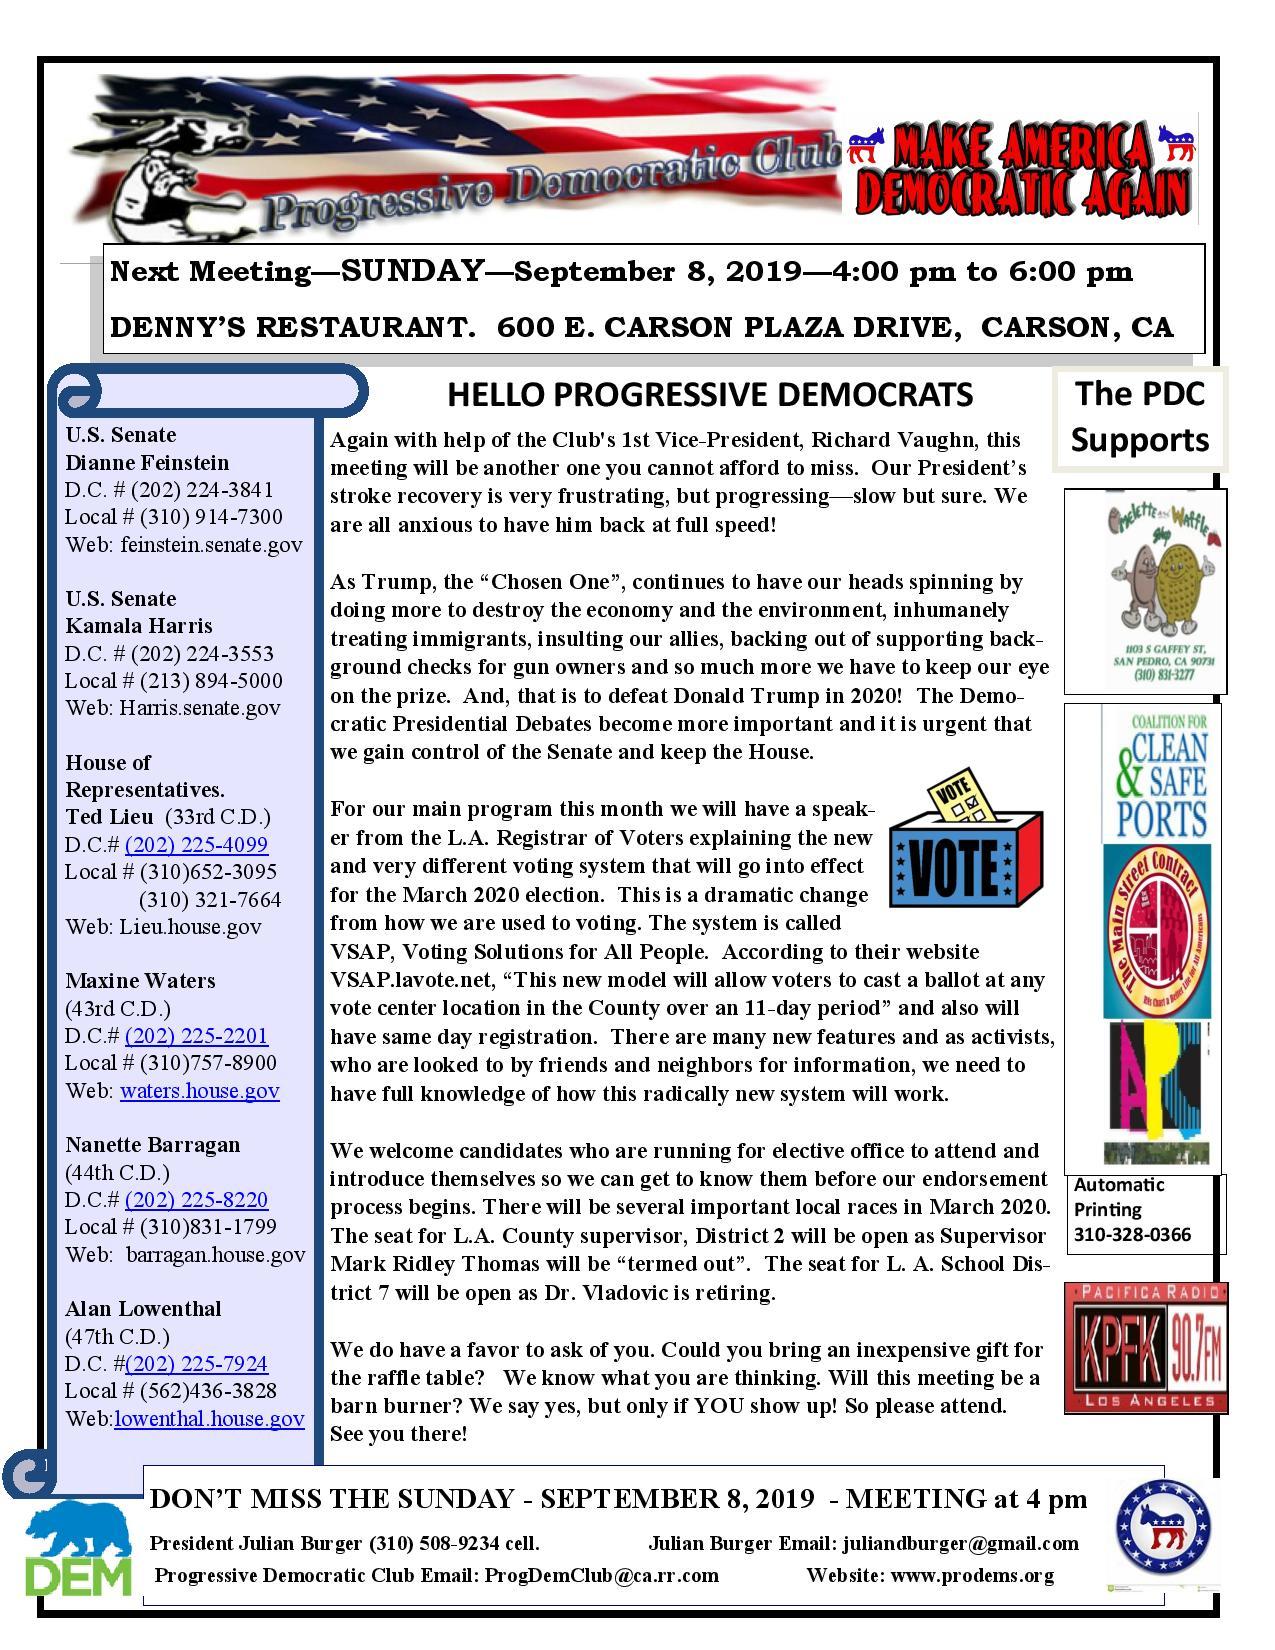 MeetingNotice_Sept_8_2019_(1)-page-001_(1).jpg